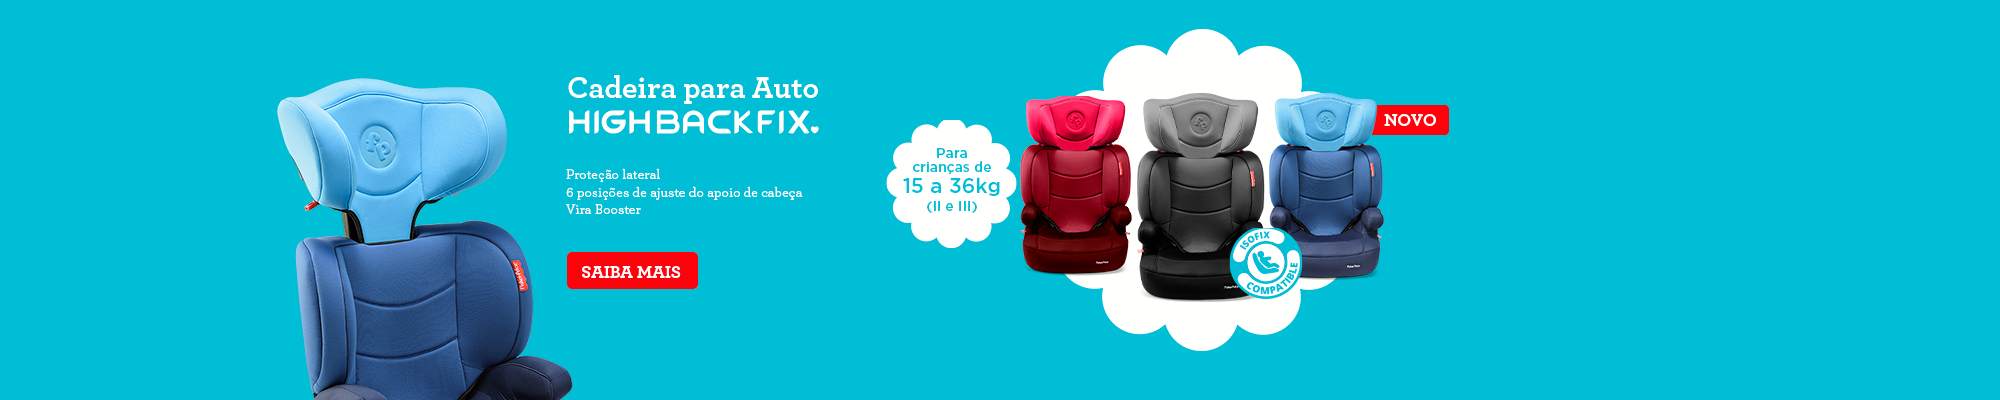 Cadeira para auto highback - 2000x400